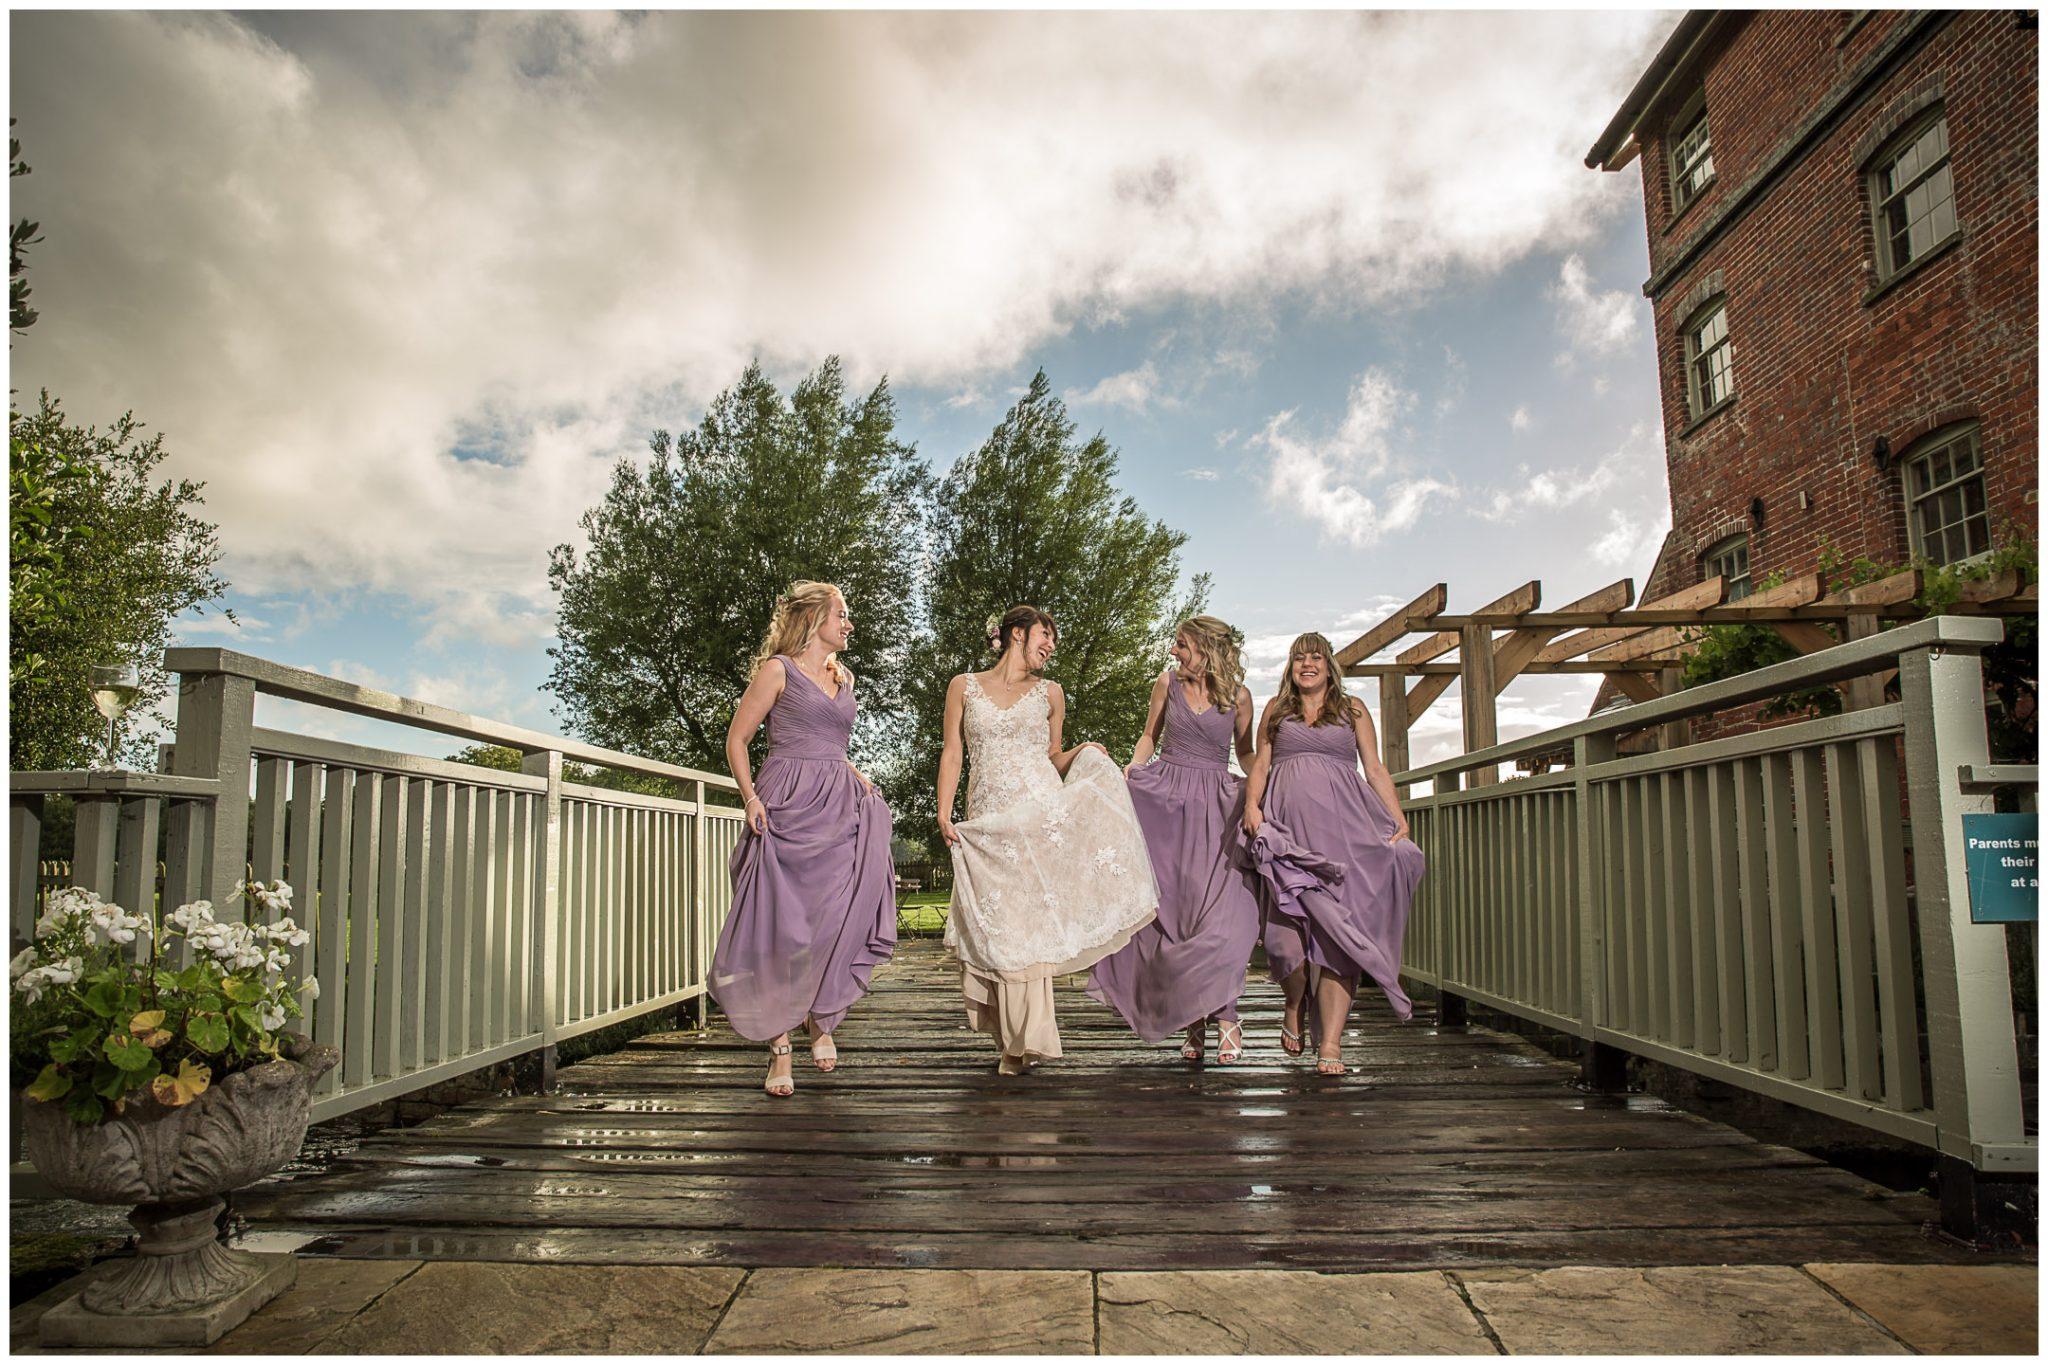 Sopley Mill wedding photography bride with bridesmaids on bridge